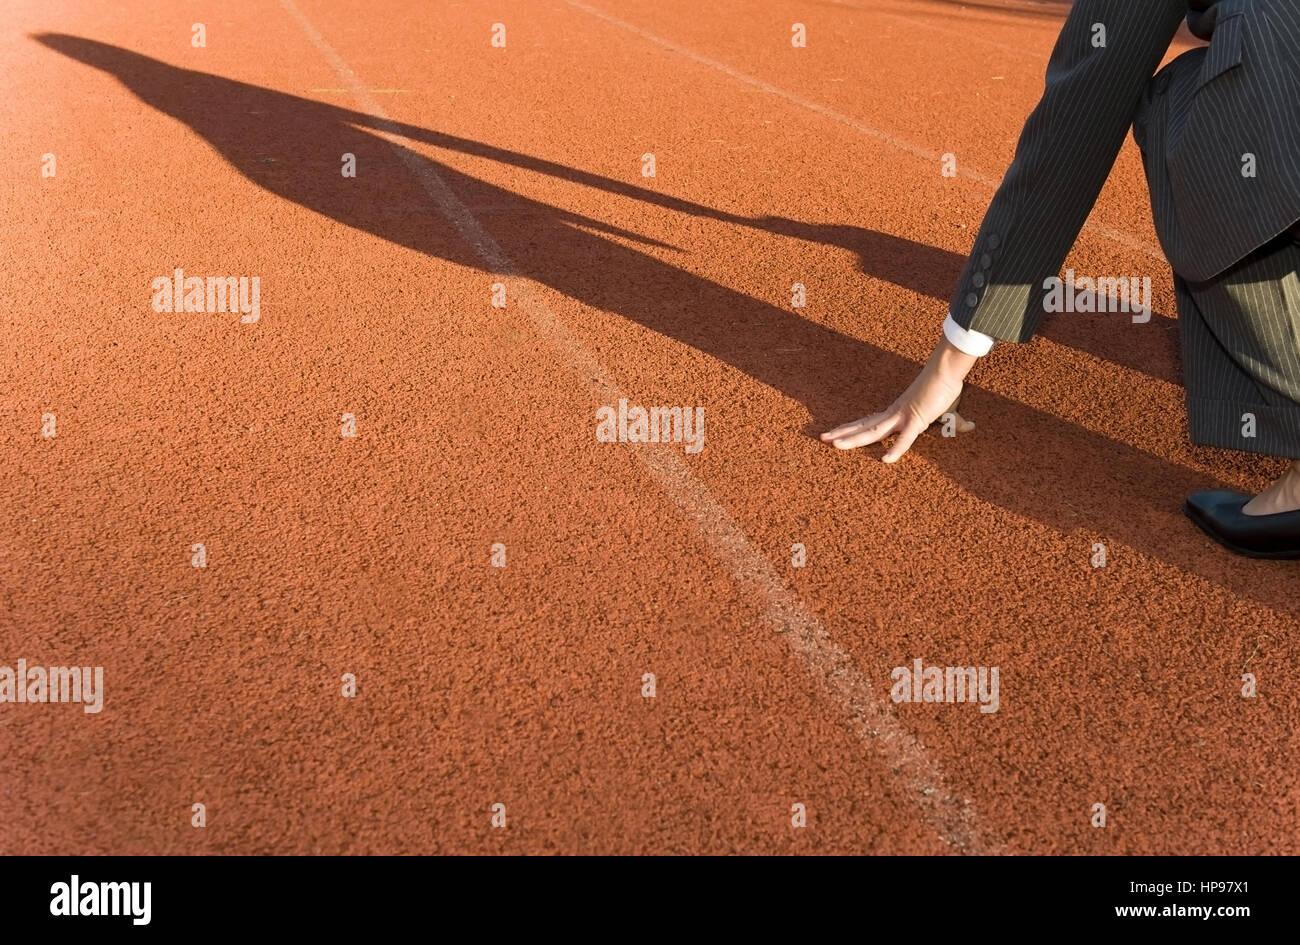 Model released , Gesch?ftsfrau in Startposition auf der Laufbahn - business woman on running track - Stock Image